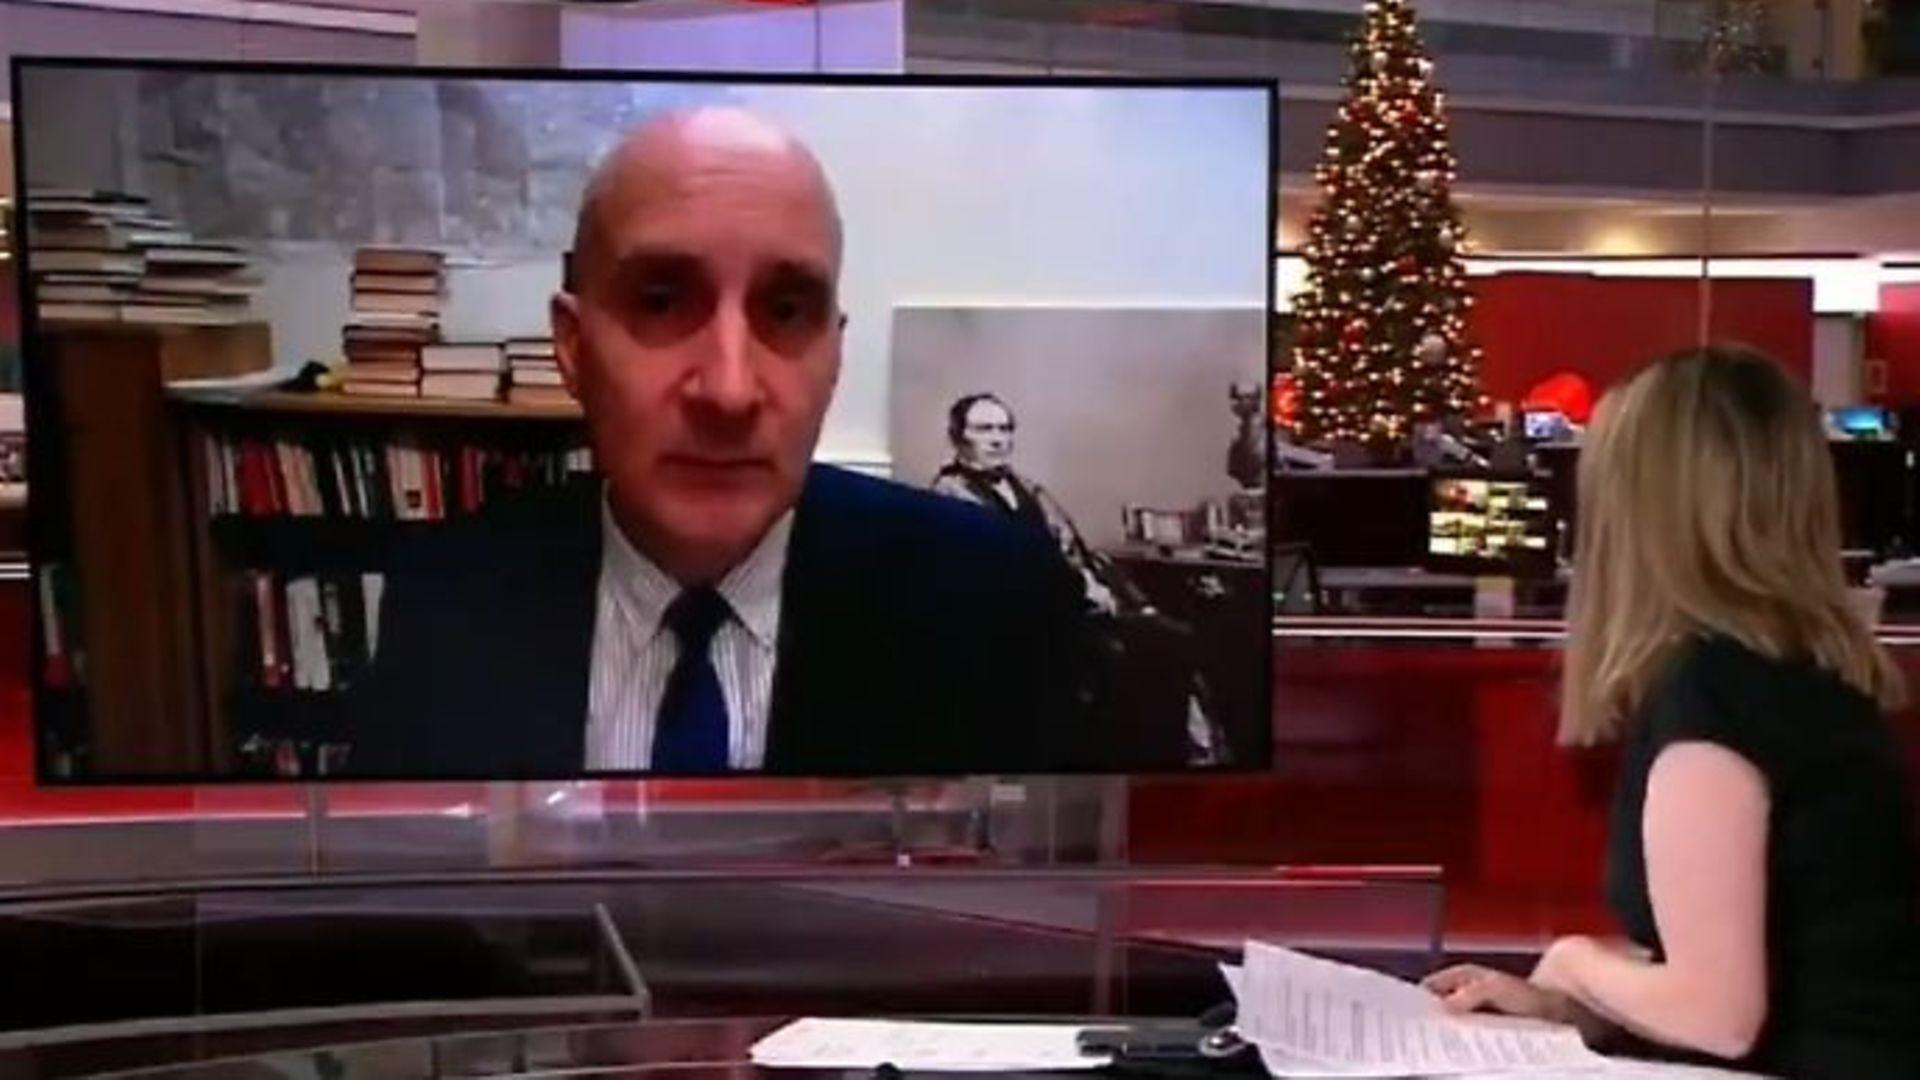 Lord Adonis on BBC News - Credit: Twitter